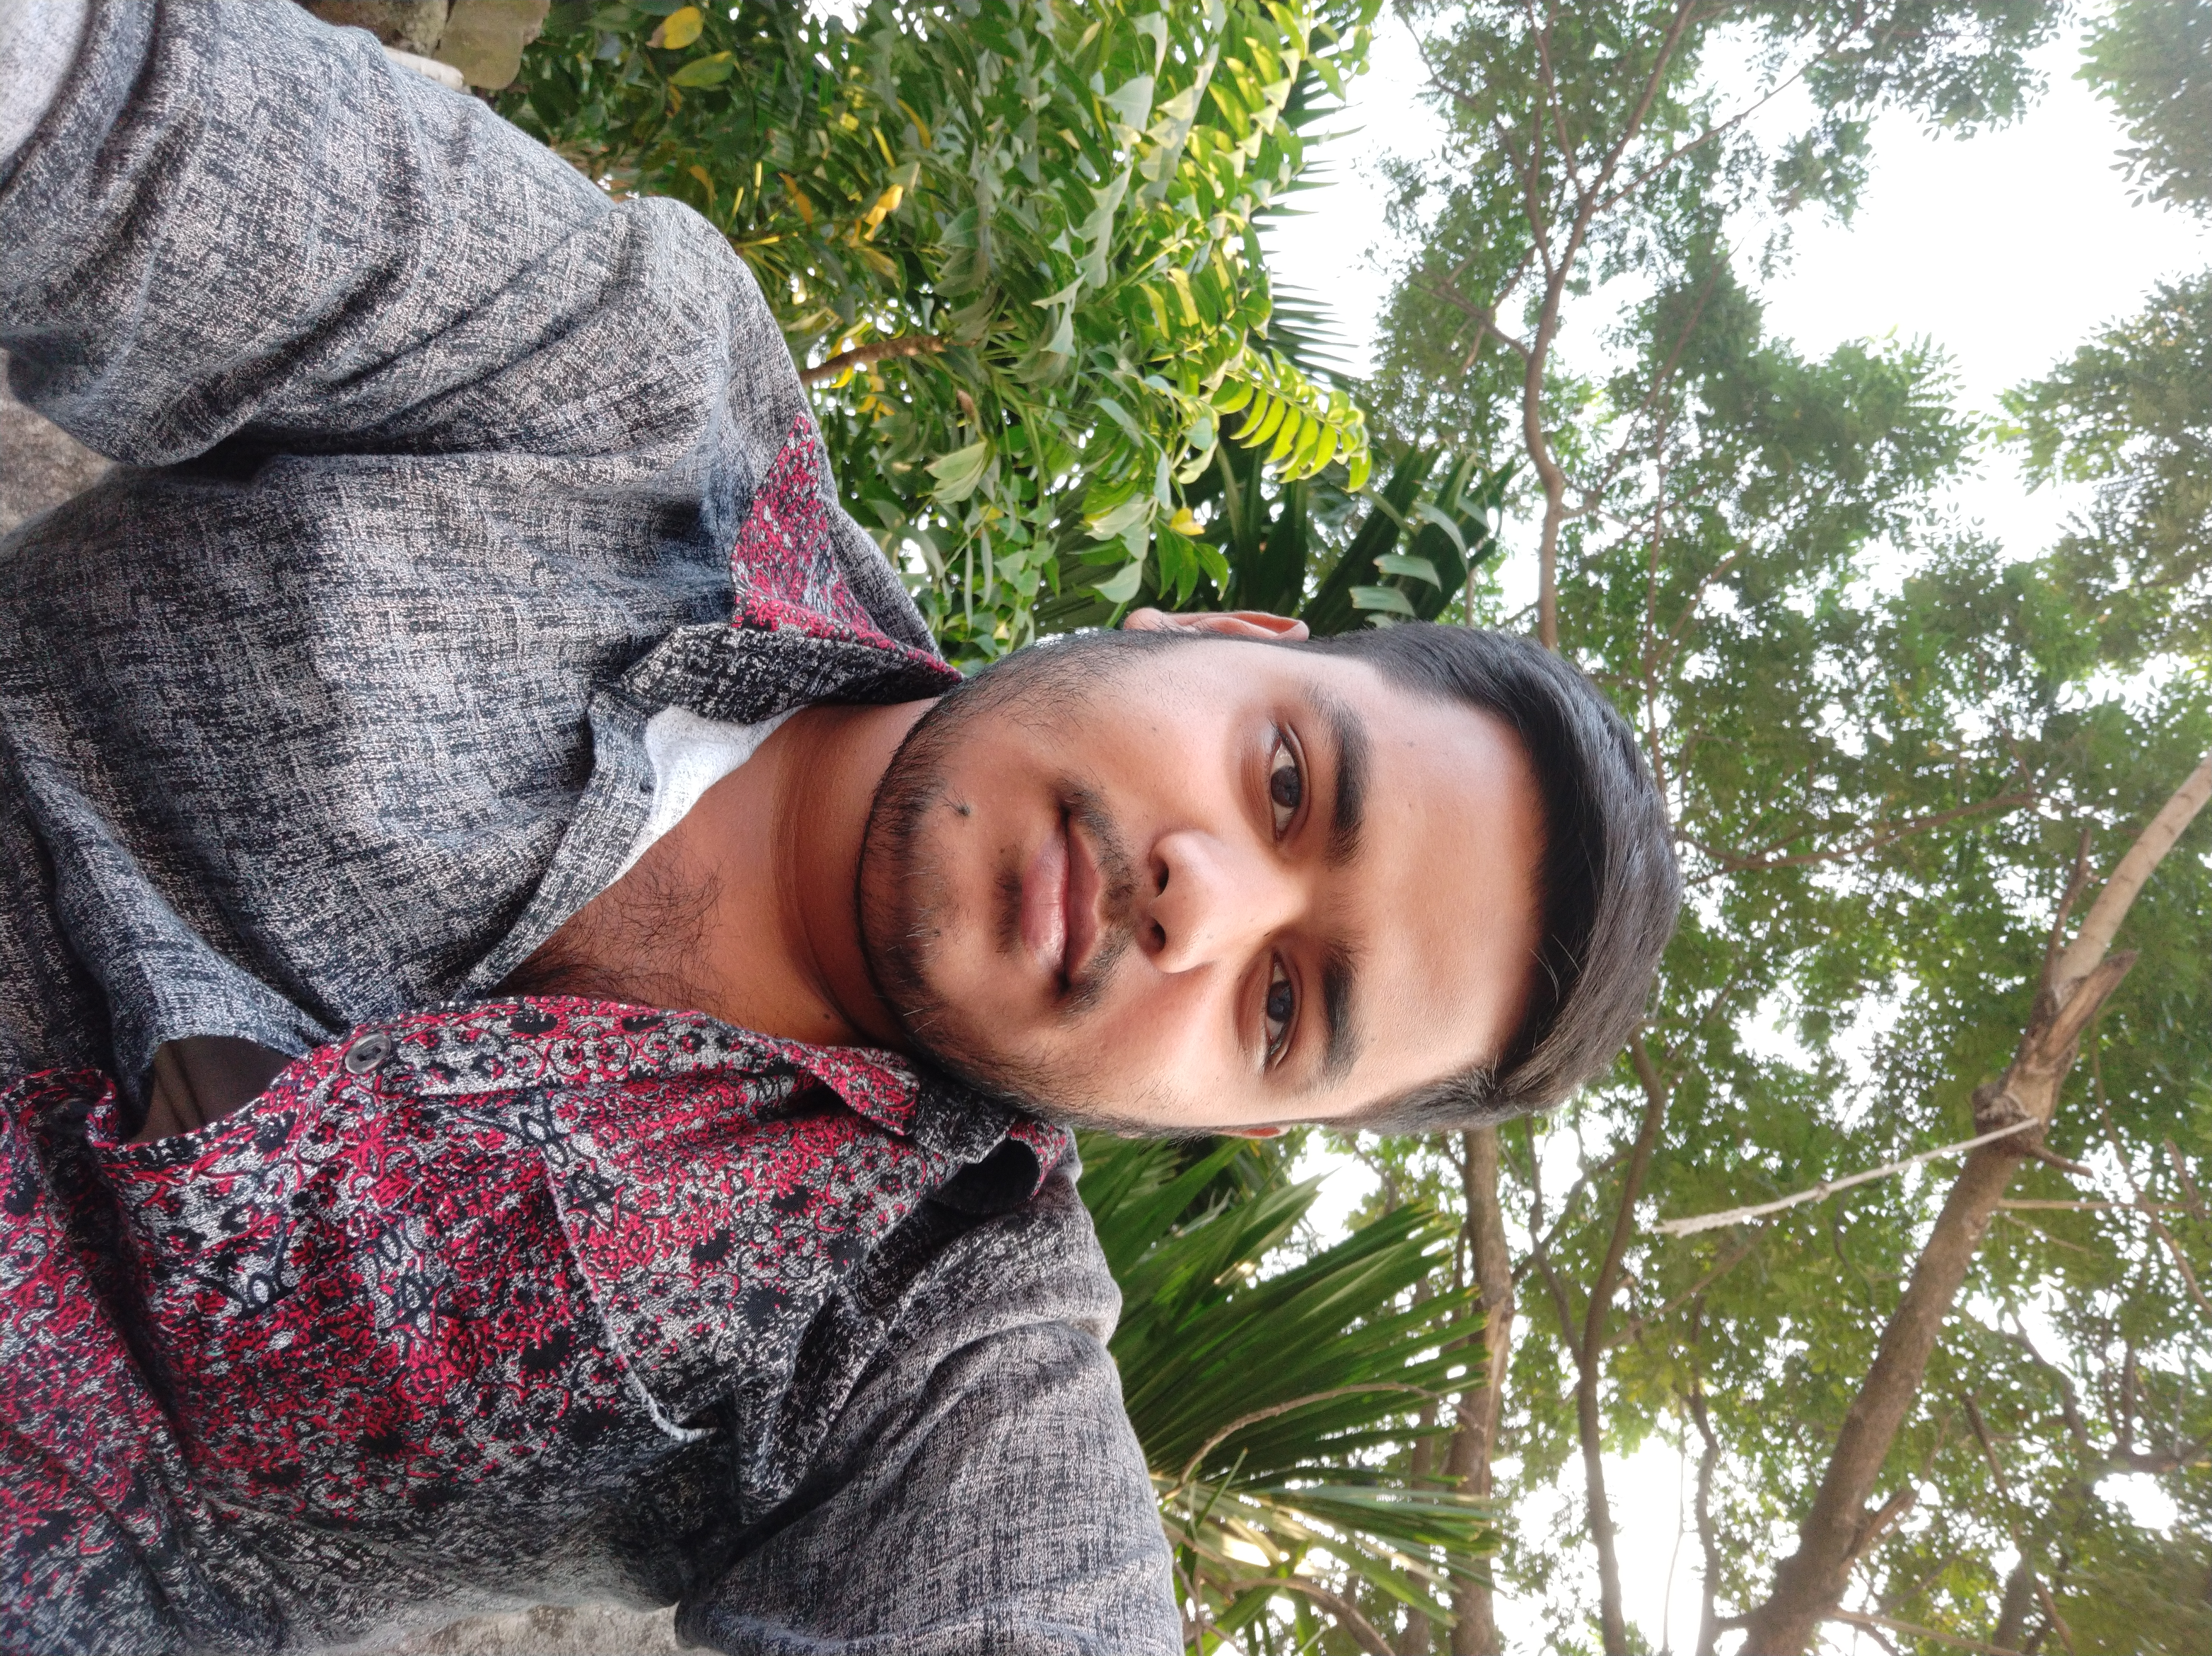 MD RASHEDUL ISLAM RAJIB Profile Picture